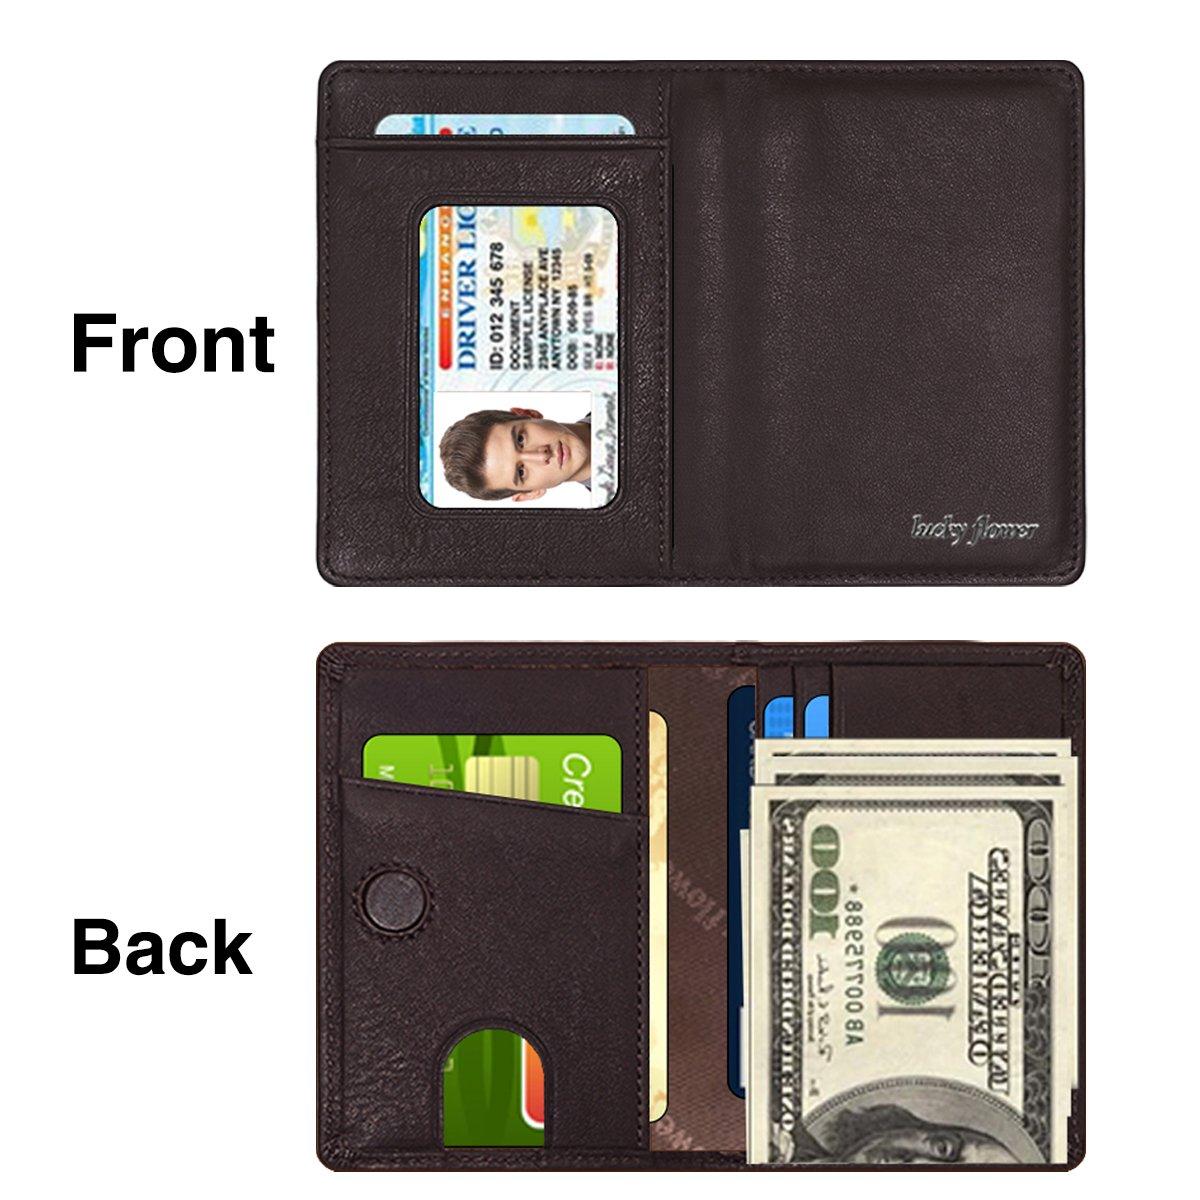 LUCKY FLOWER RFID Blocking Travel Wallet for Men,Minimalist Genuine Leather Slim Bifold Card Holder Purse(Coffee) by LUCKY FLOWER (Image #1)